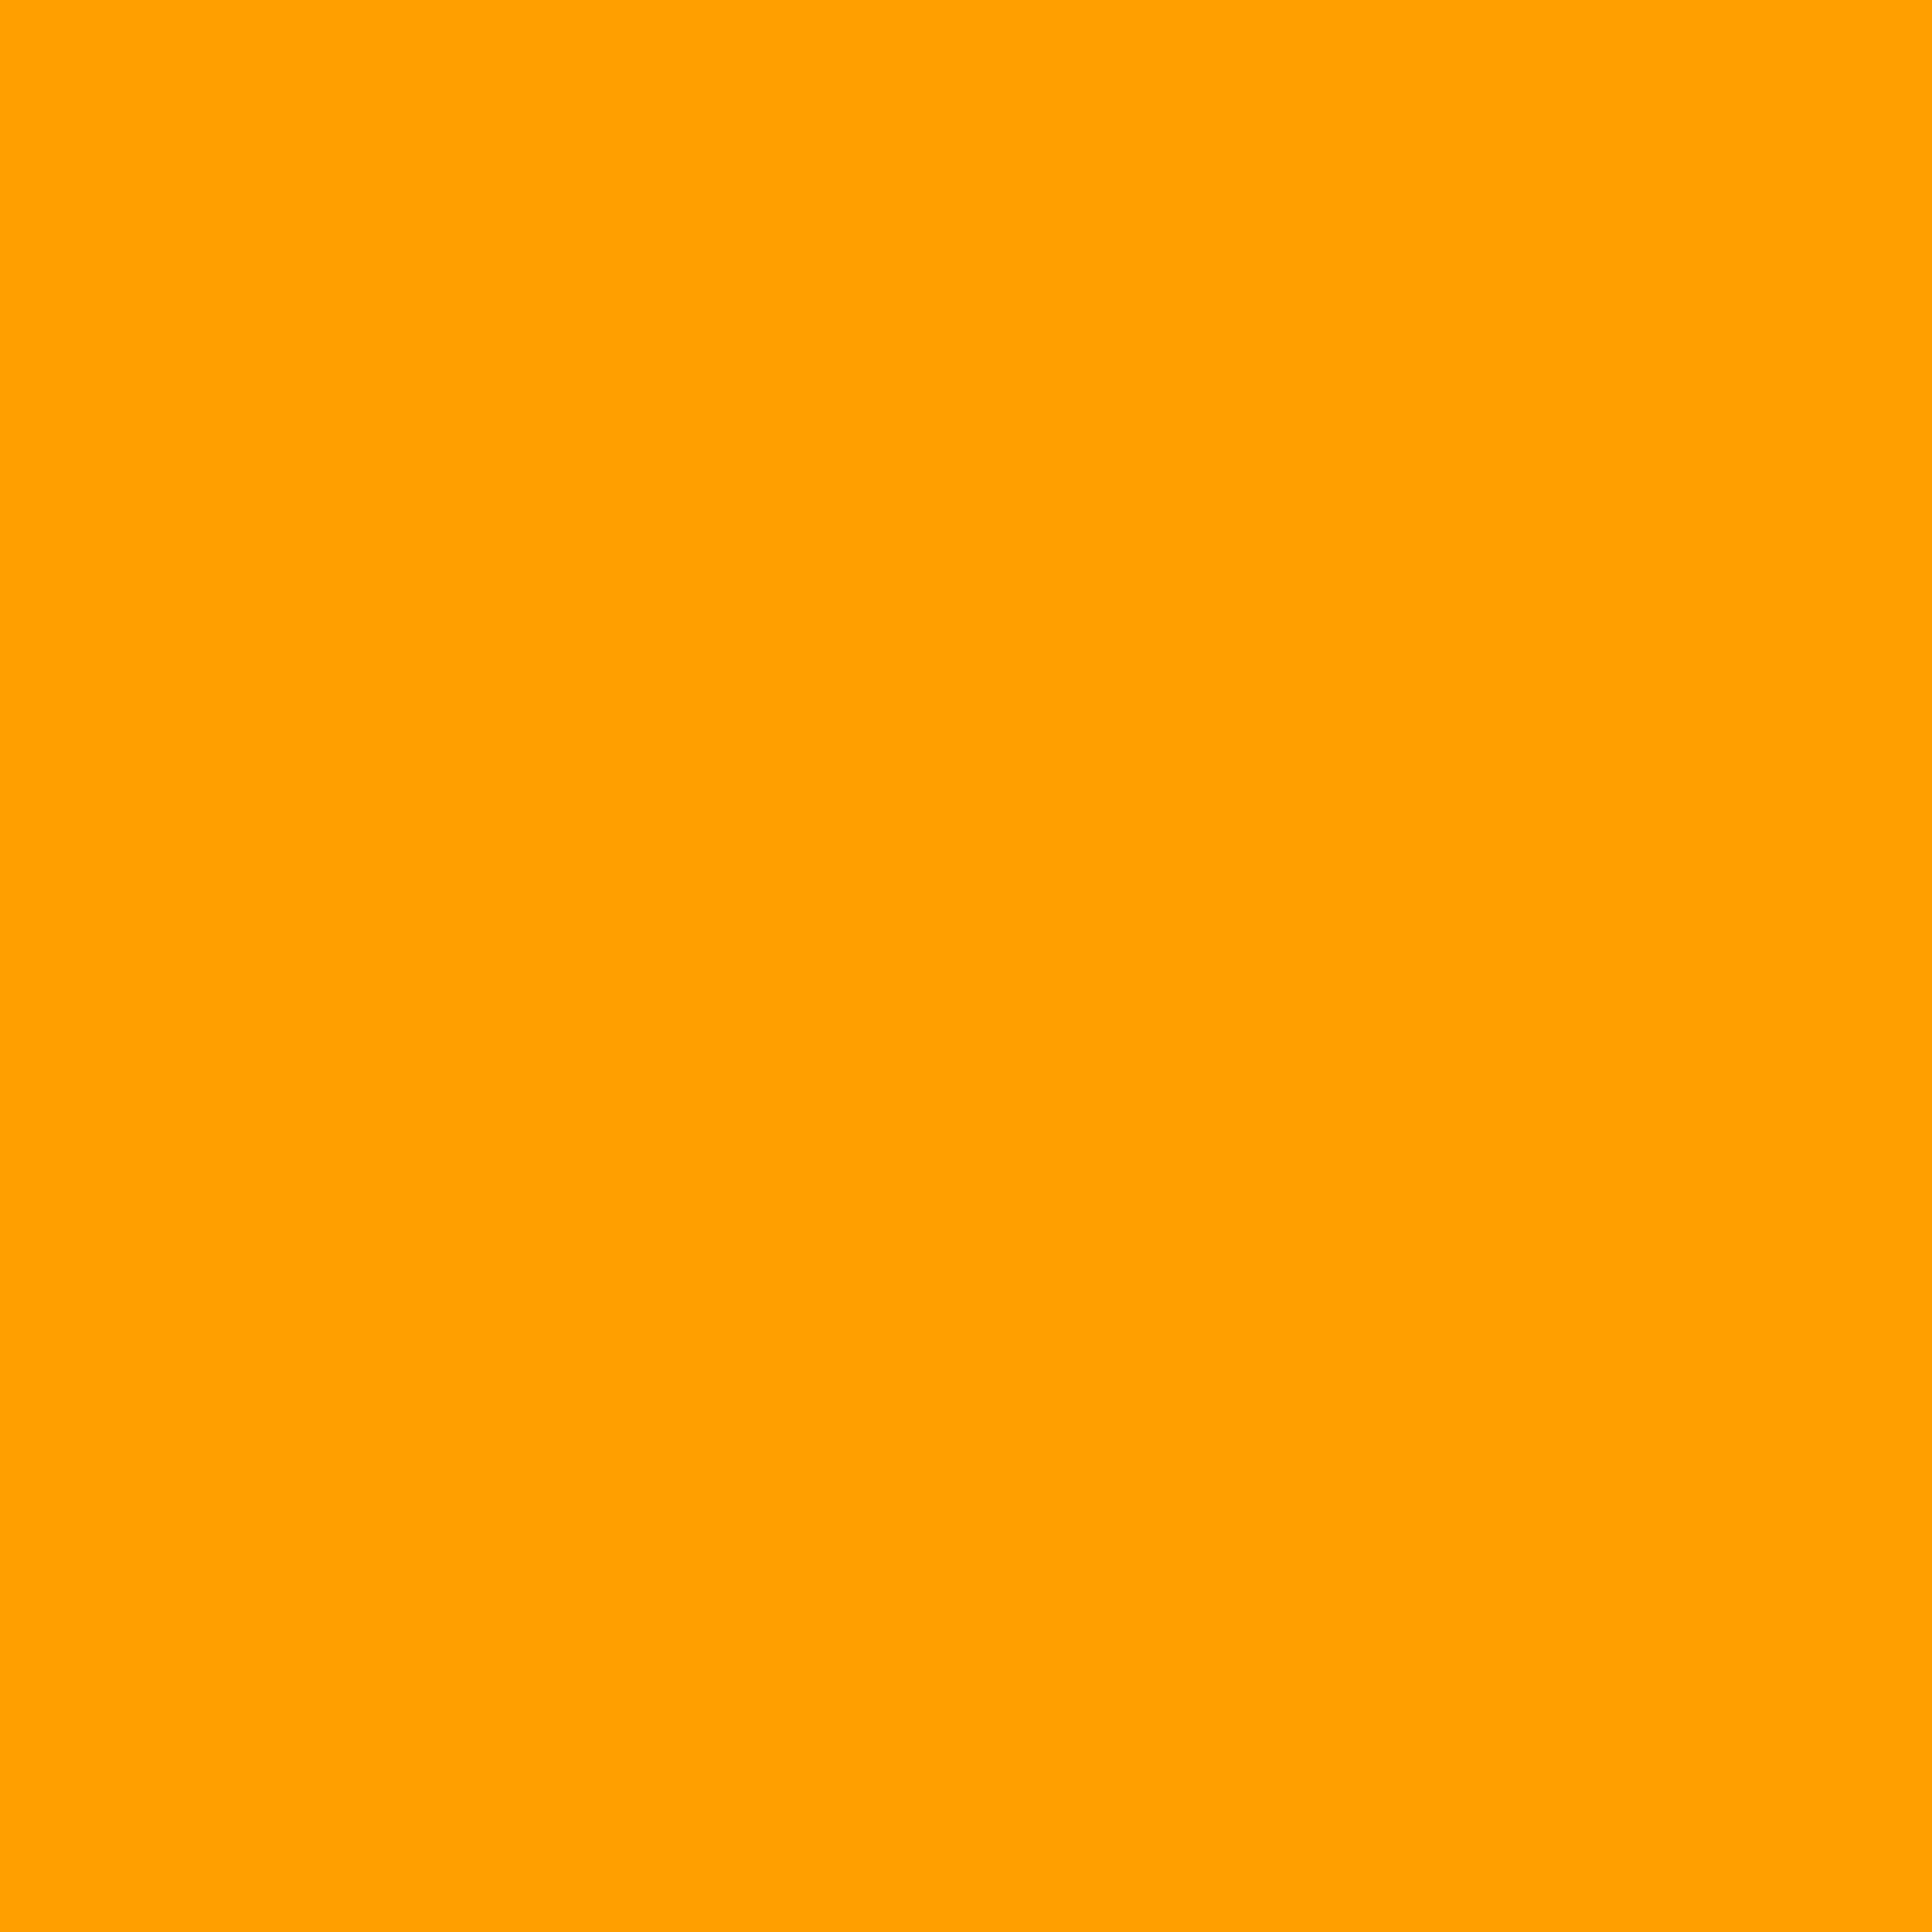 2048x2048 Orange Peel Solid Color Background